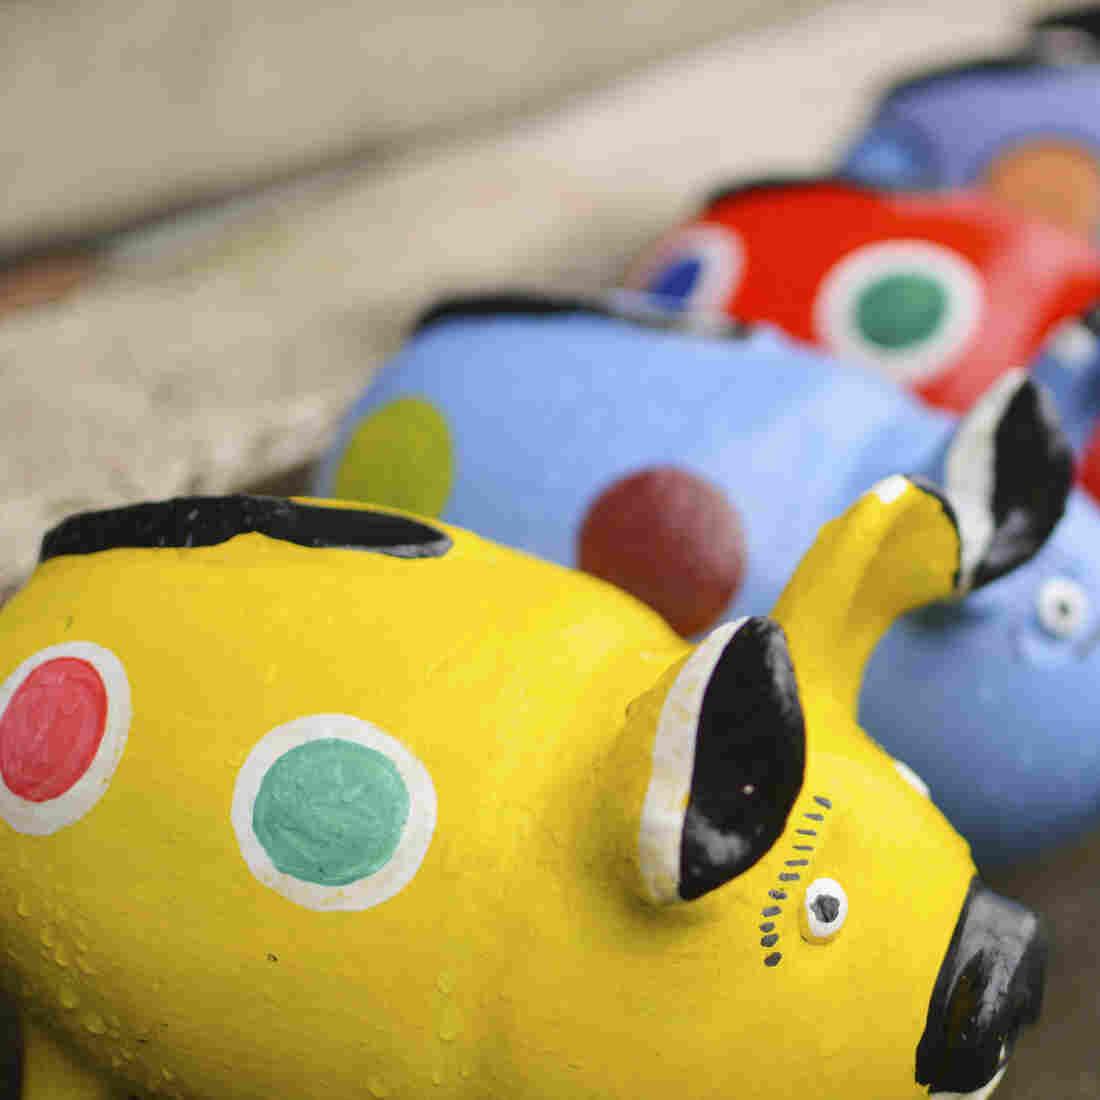 Ceramic handcrafted piggy banks in the shops near Masaya, Nicaragua.